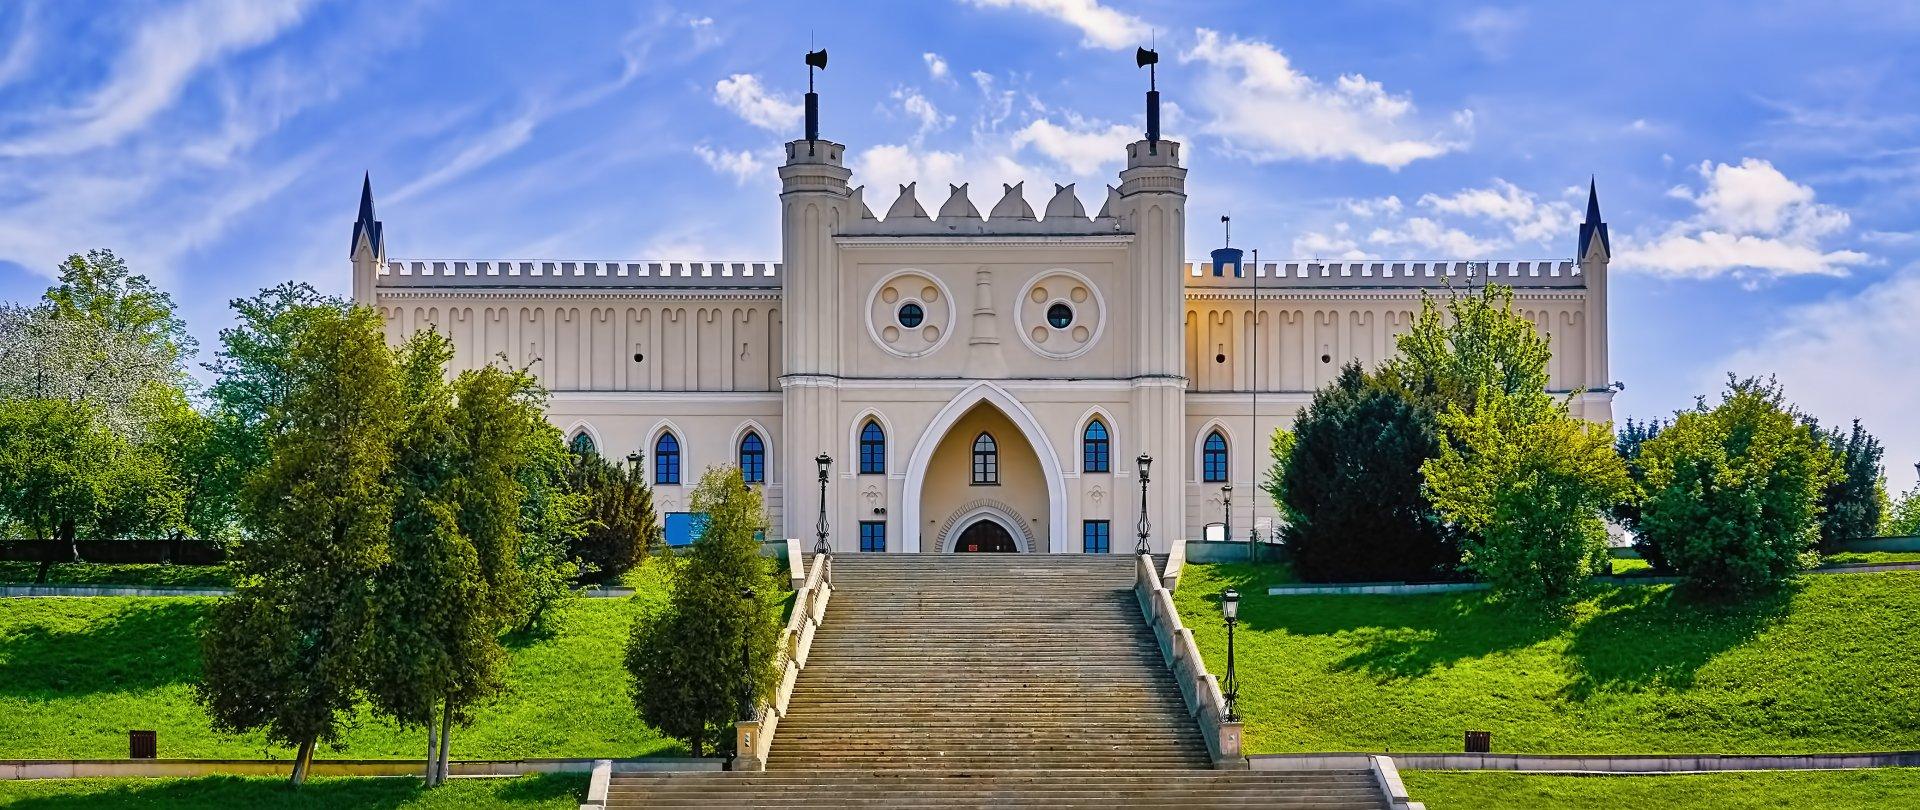 Arche Lublin, Lublin